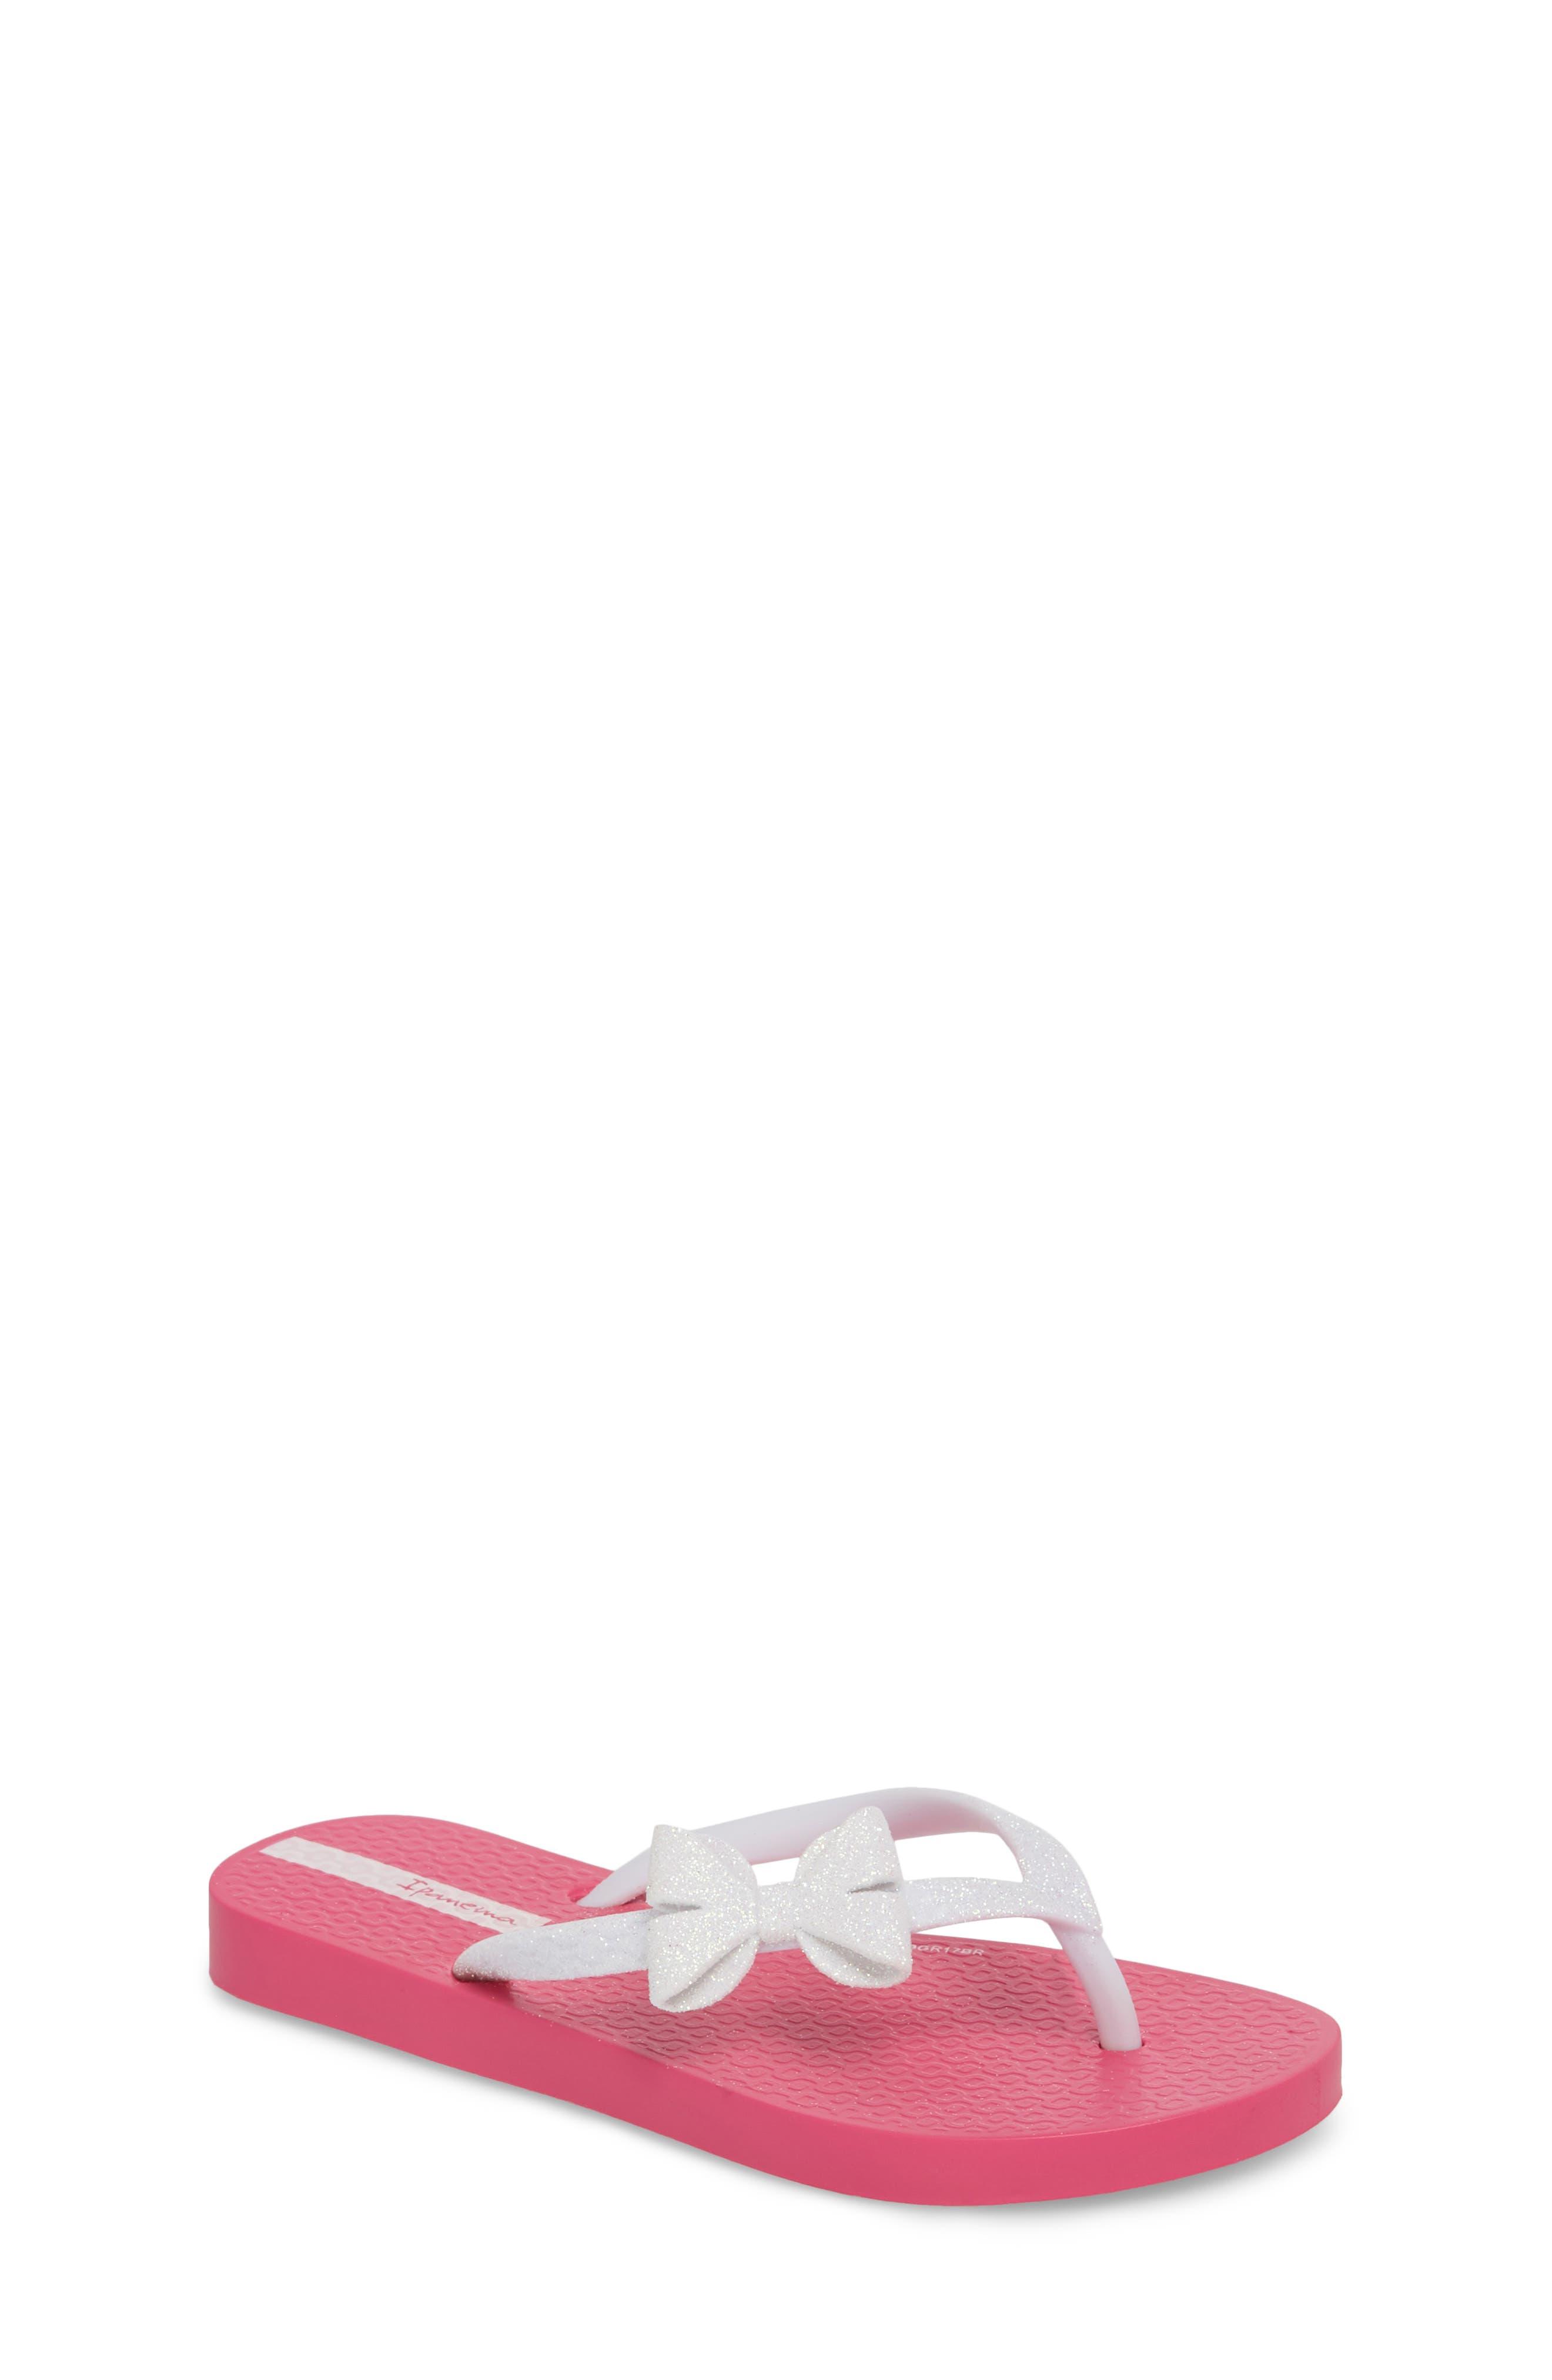 IPANEMA Glitter IV Flip Flop, Main, color, PINK/ WHITE